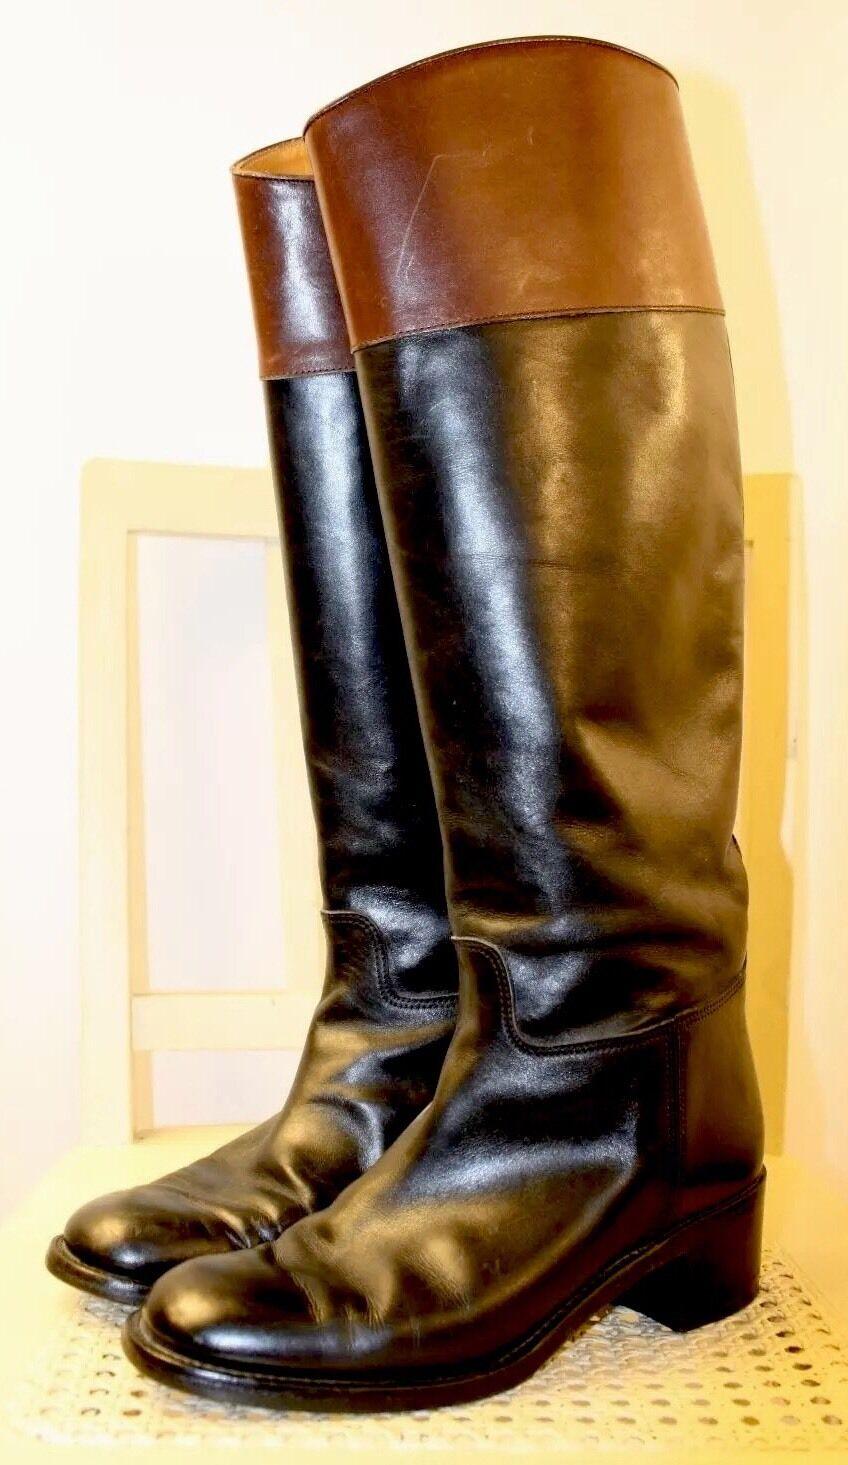 RALPH LAUREN Collection Leather Equestrian Equestrian Equestrian English Riding bottes 6.5B ITALY Rare 7d1684